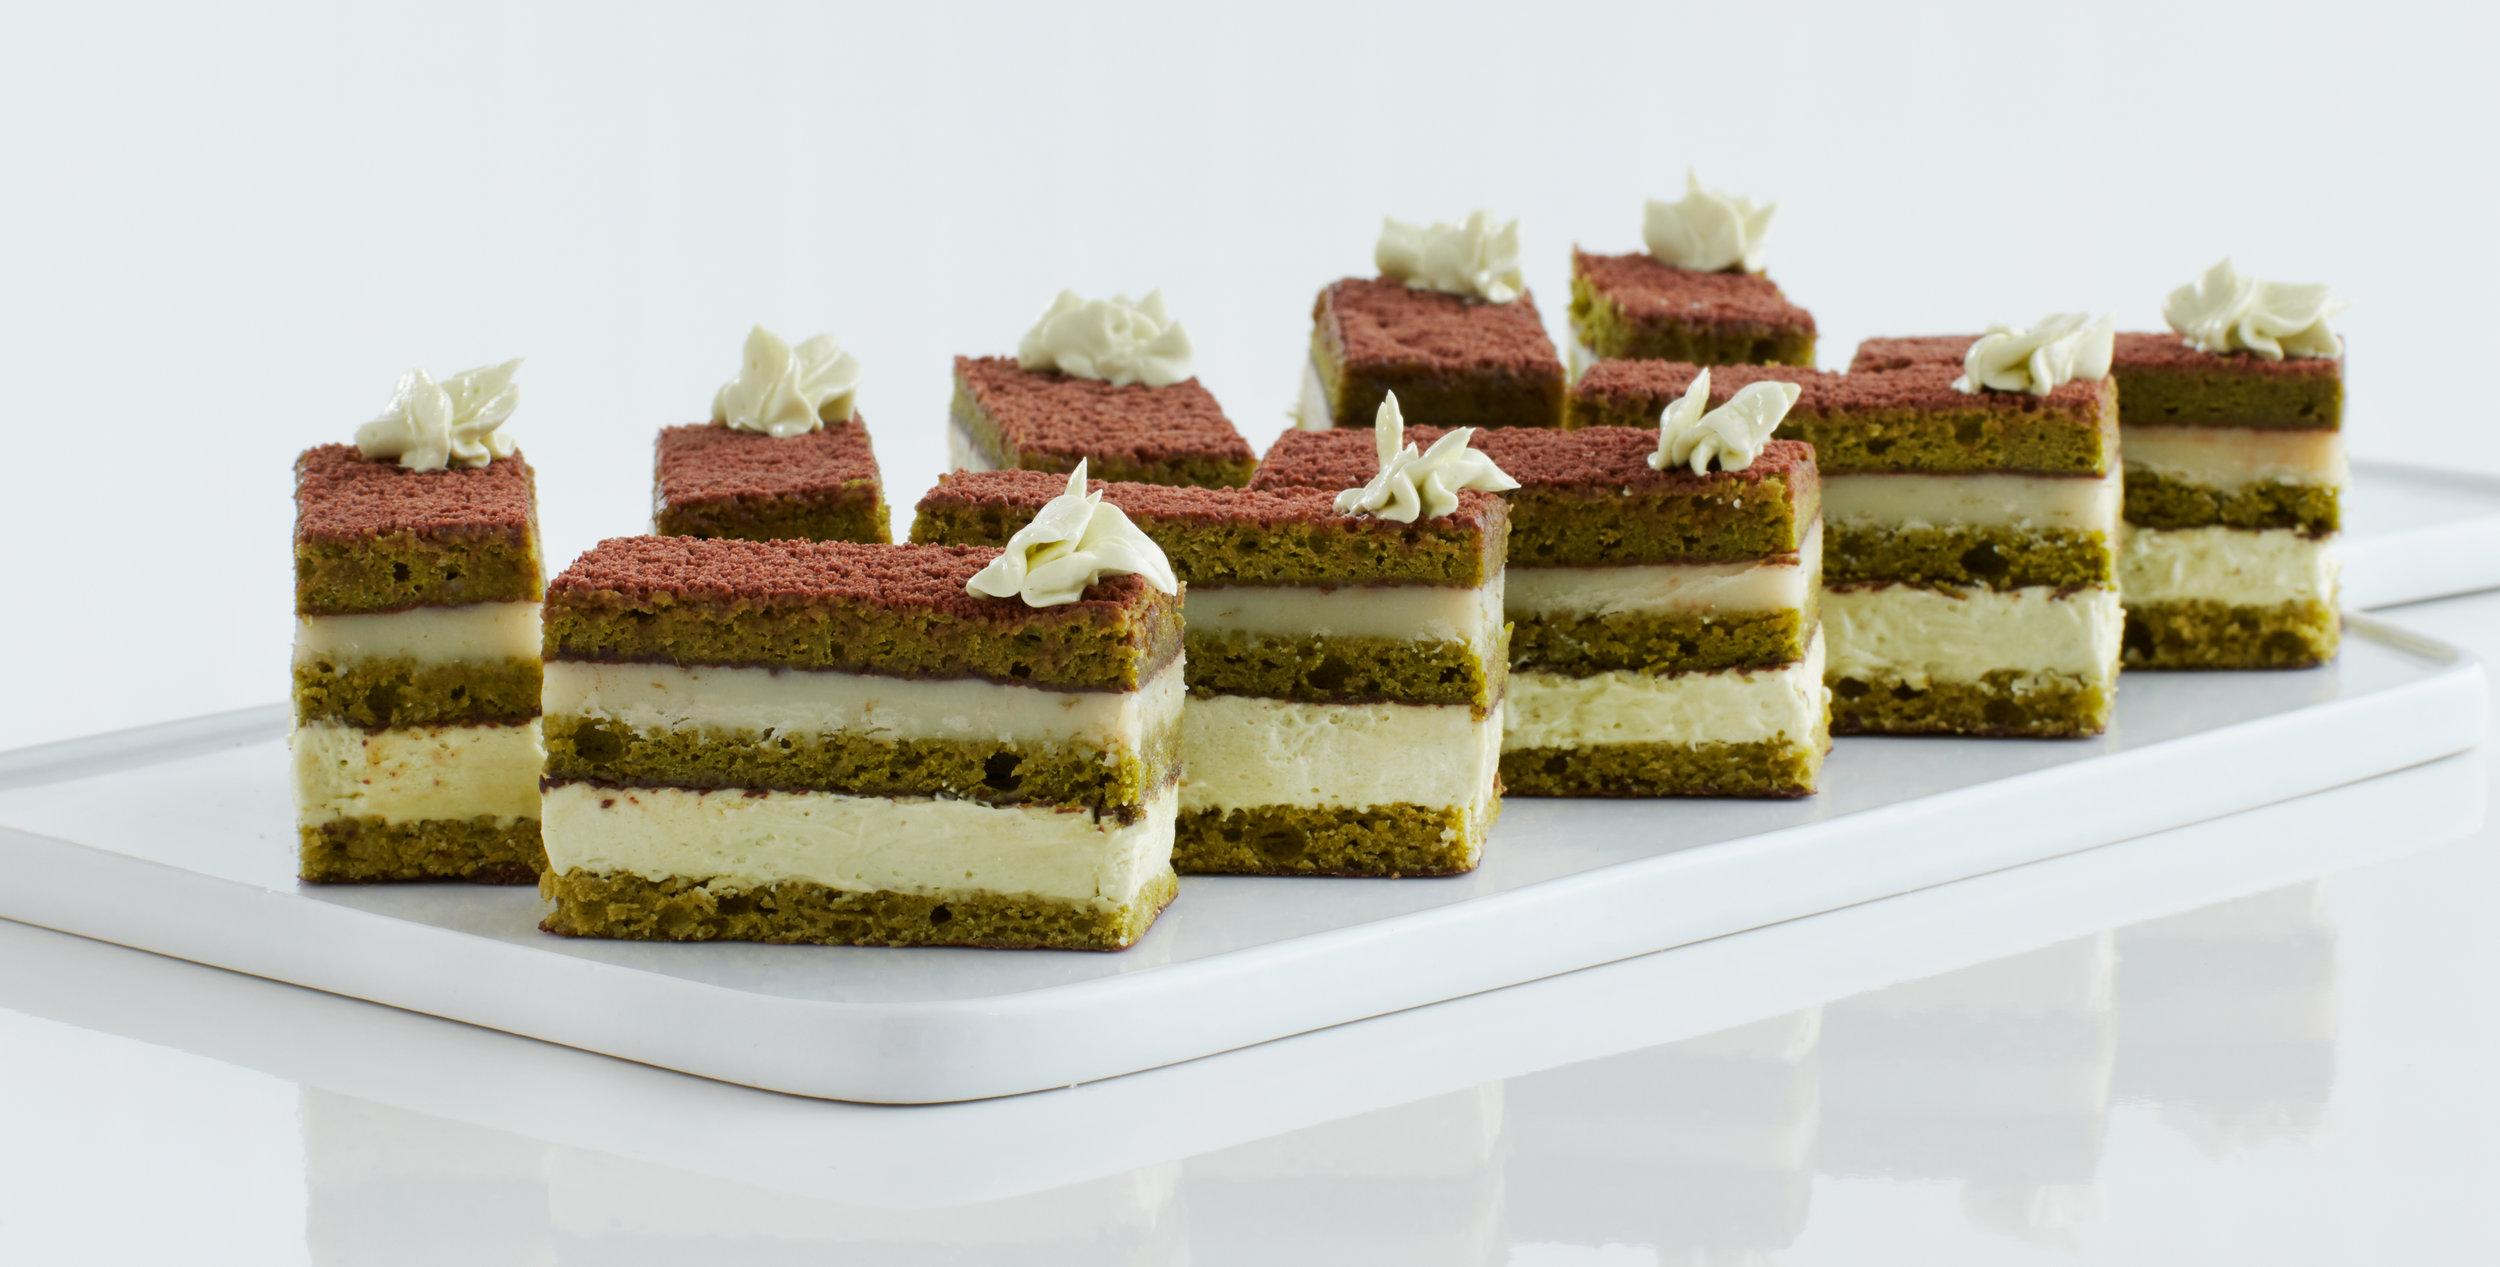 SOC_Catering17_Dessert_Mini-Matcha-Opera-Cake-1.jpg